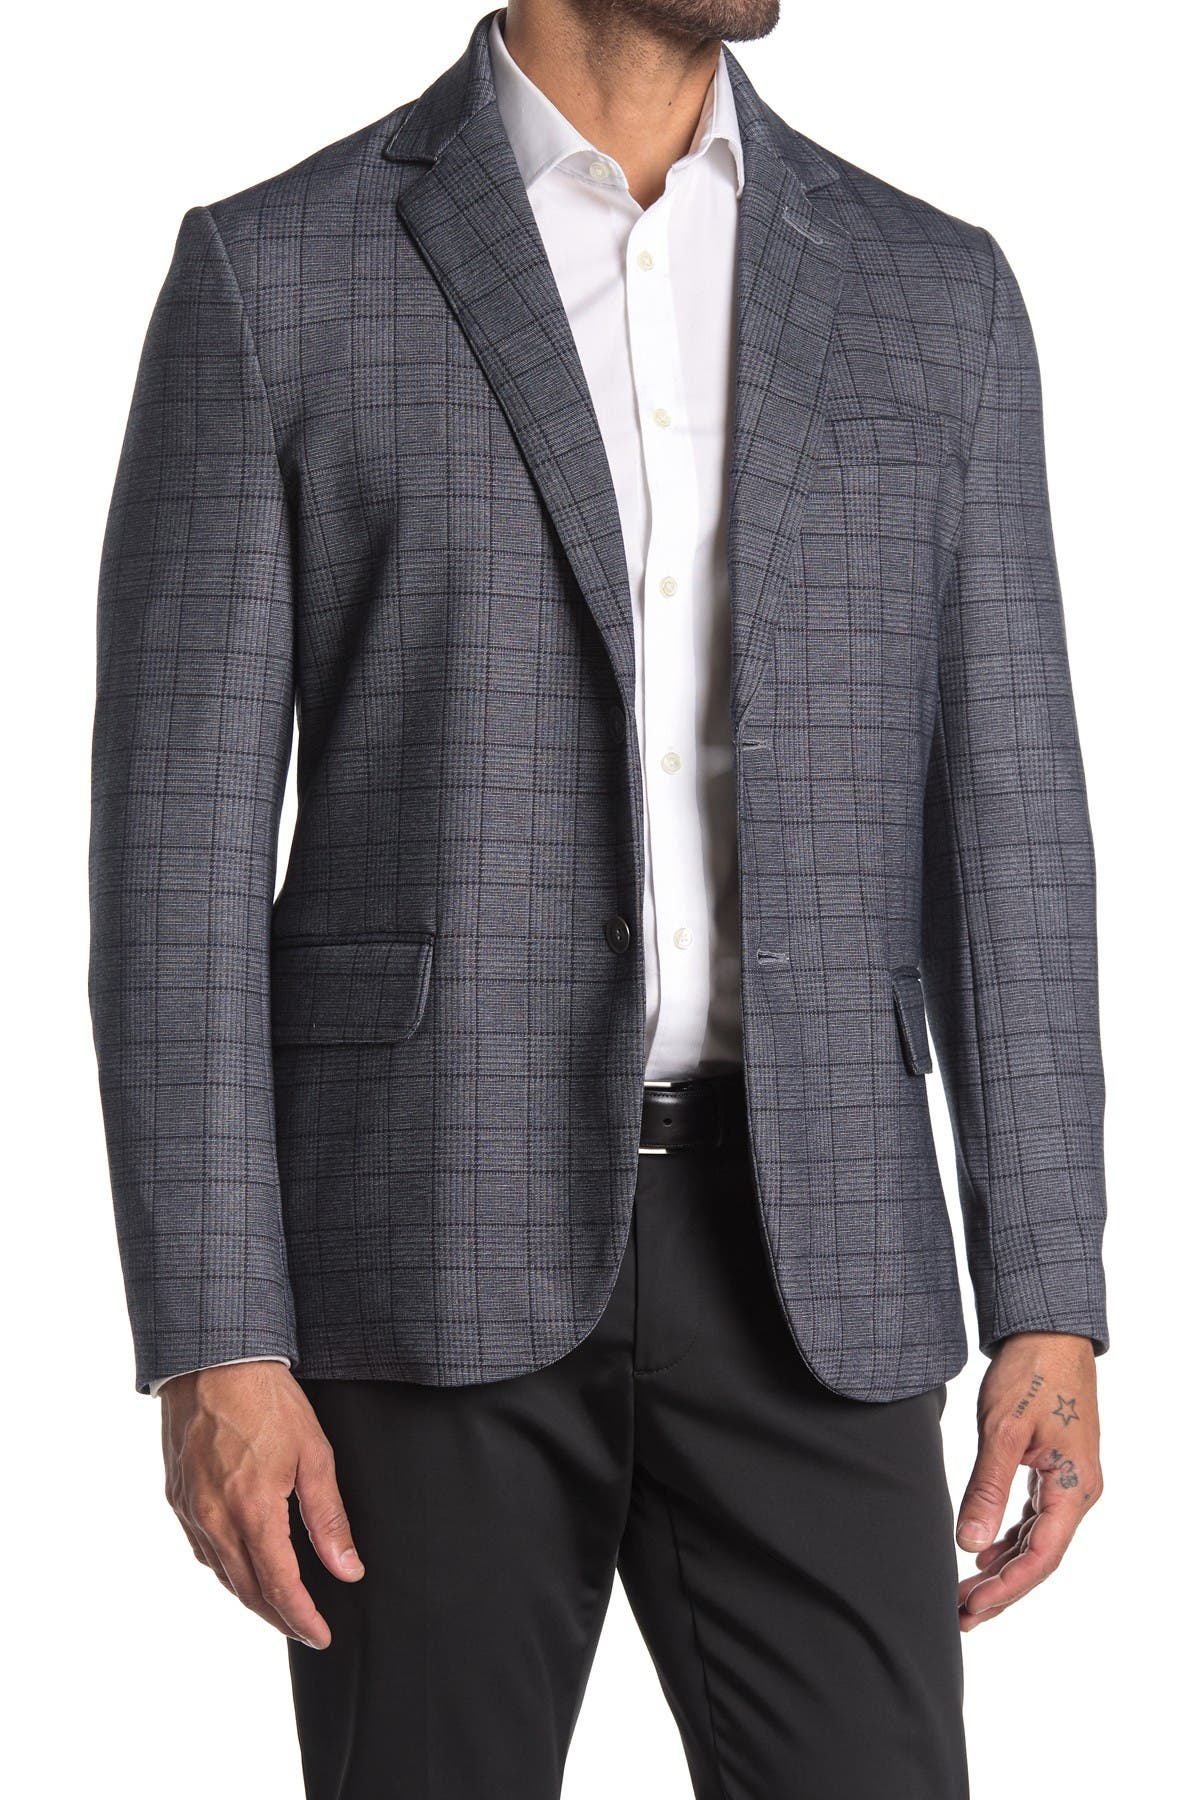 Image of CONSTRUCT Grey Plaid Two Button Notch Lapel Slim Fit Blazer